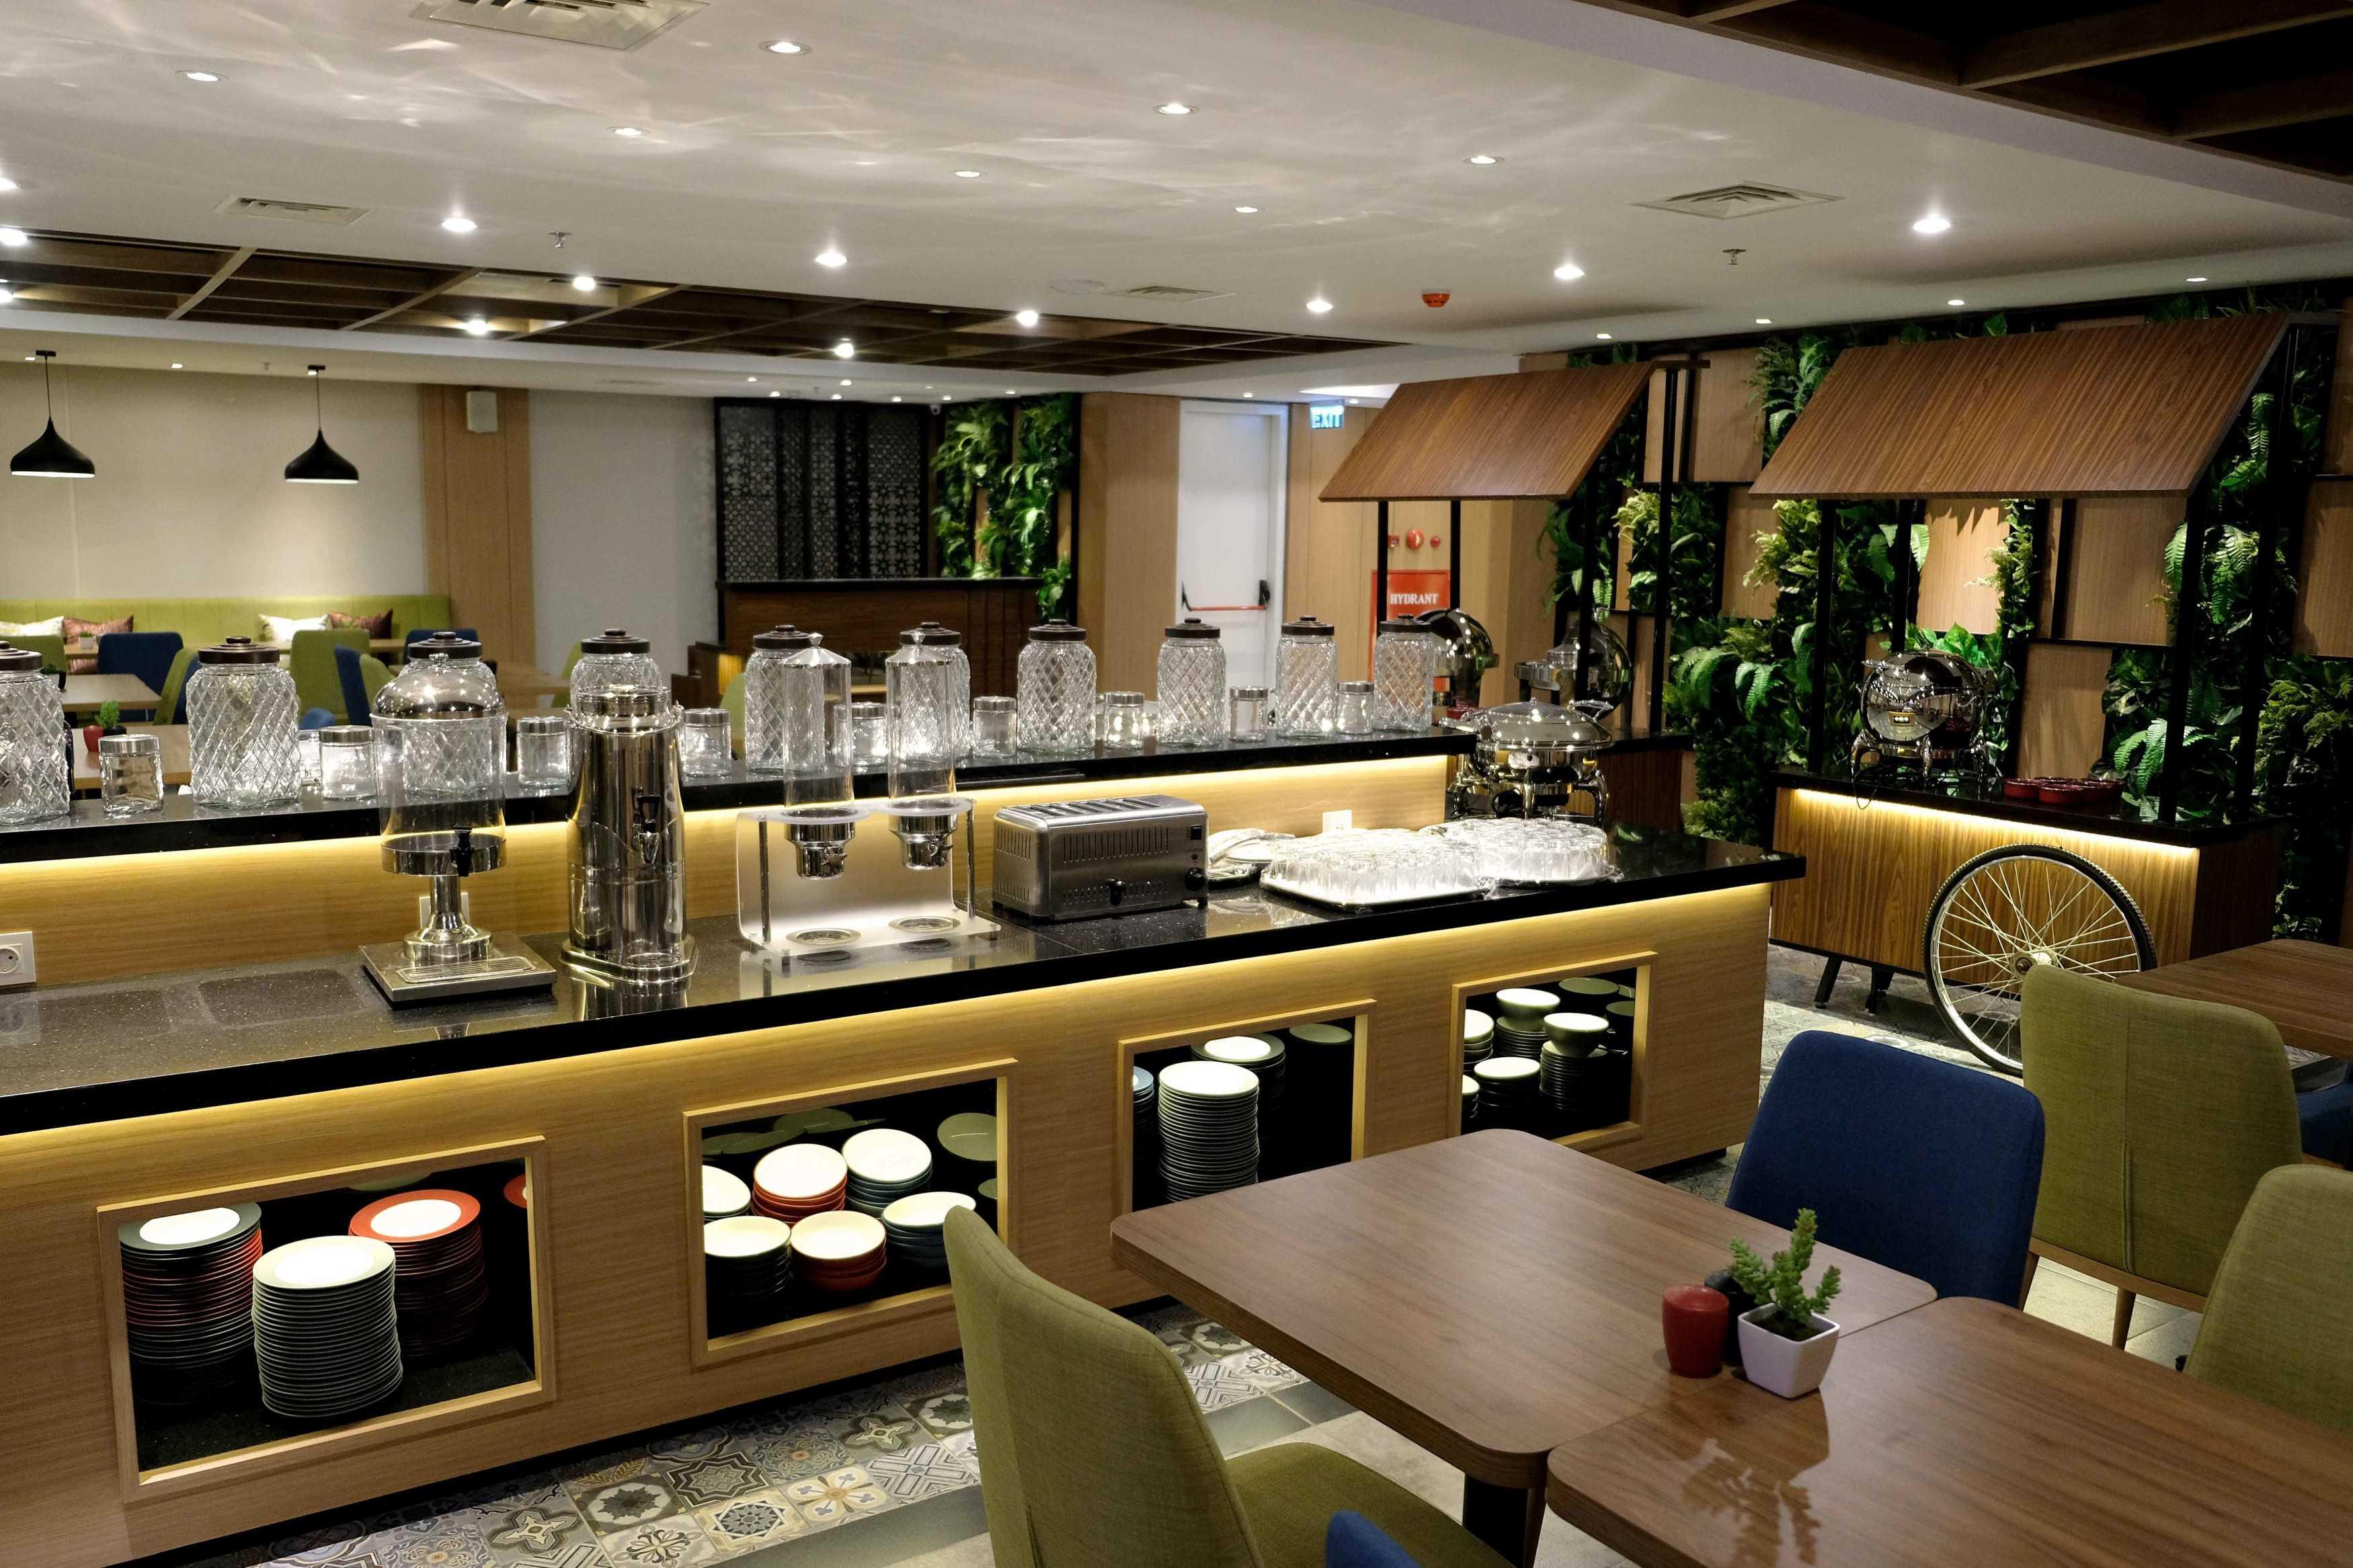 Equil Interior Hotel Dafam Pacific Caesar Surabaya, Kota Sby, Jawa Timur, Indonesia Surabaya, Kota Sby, Jawa Timur, Indonesia Equil-Interior-Hotel-Dafam-Pacific-Caesar   53780